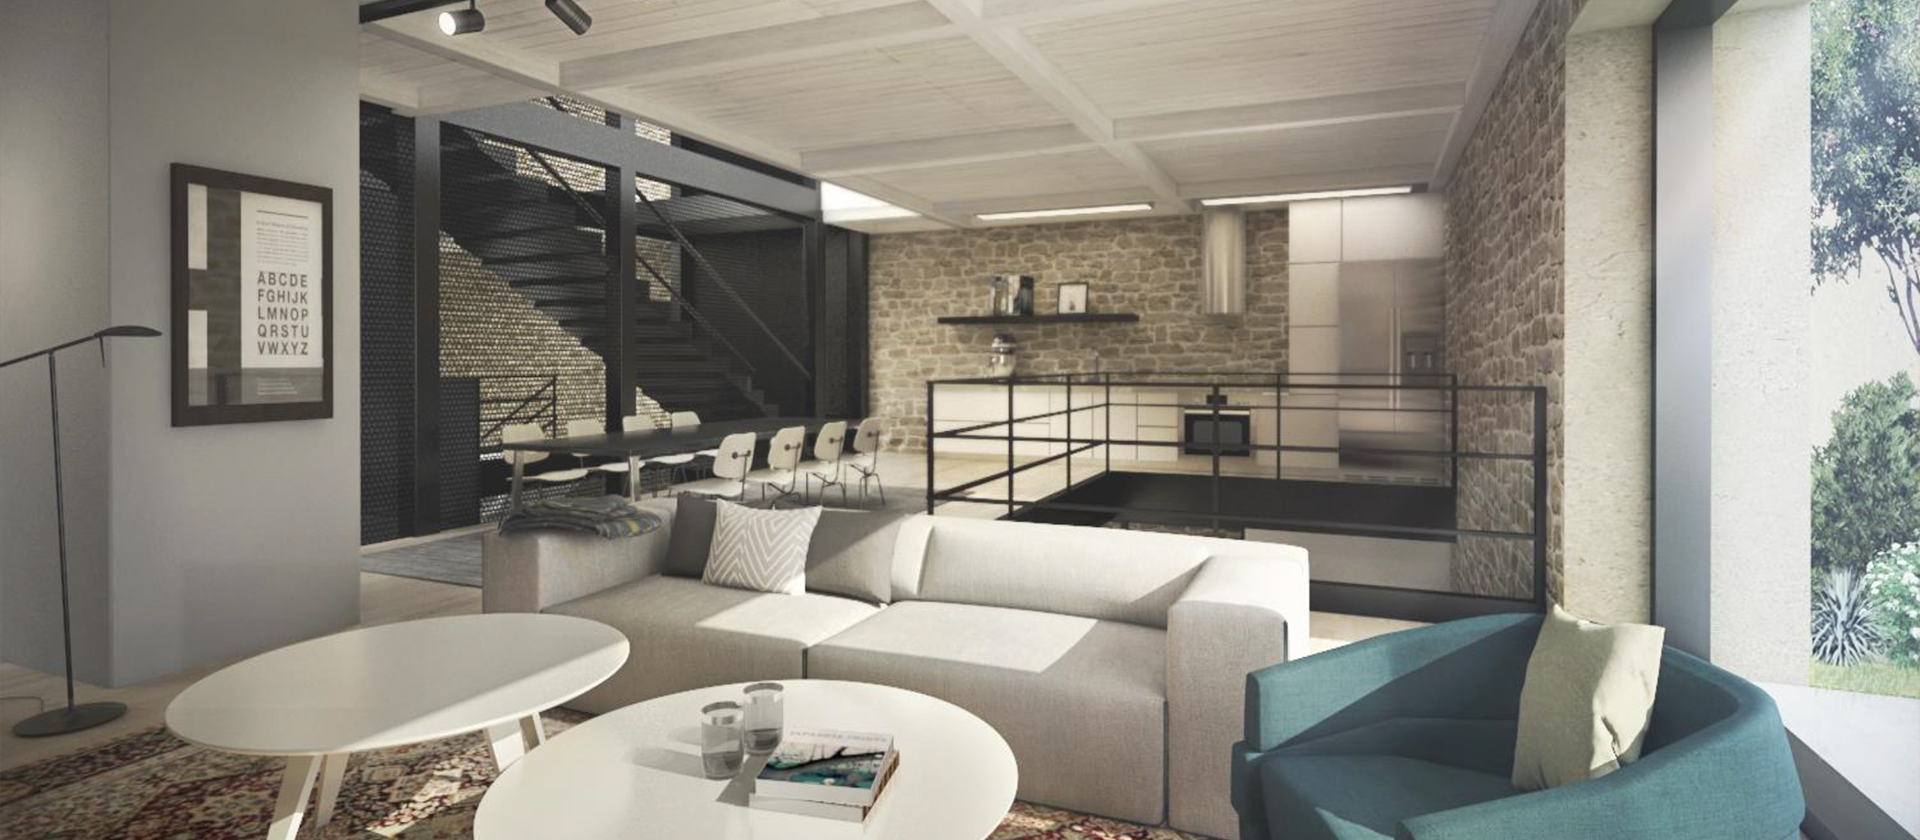 FIDI, Italy - Interior Design School in Florence - Design School ... - ^